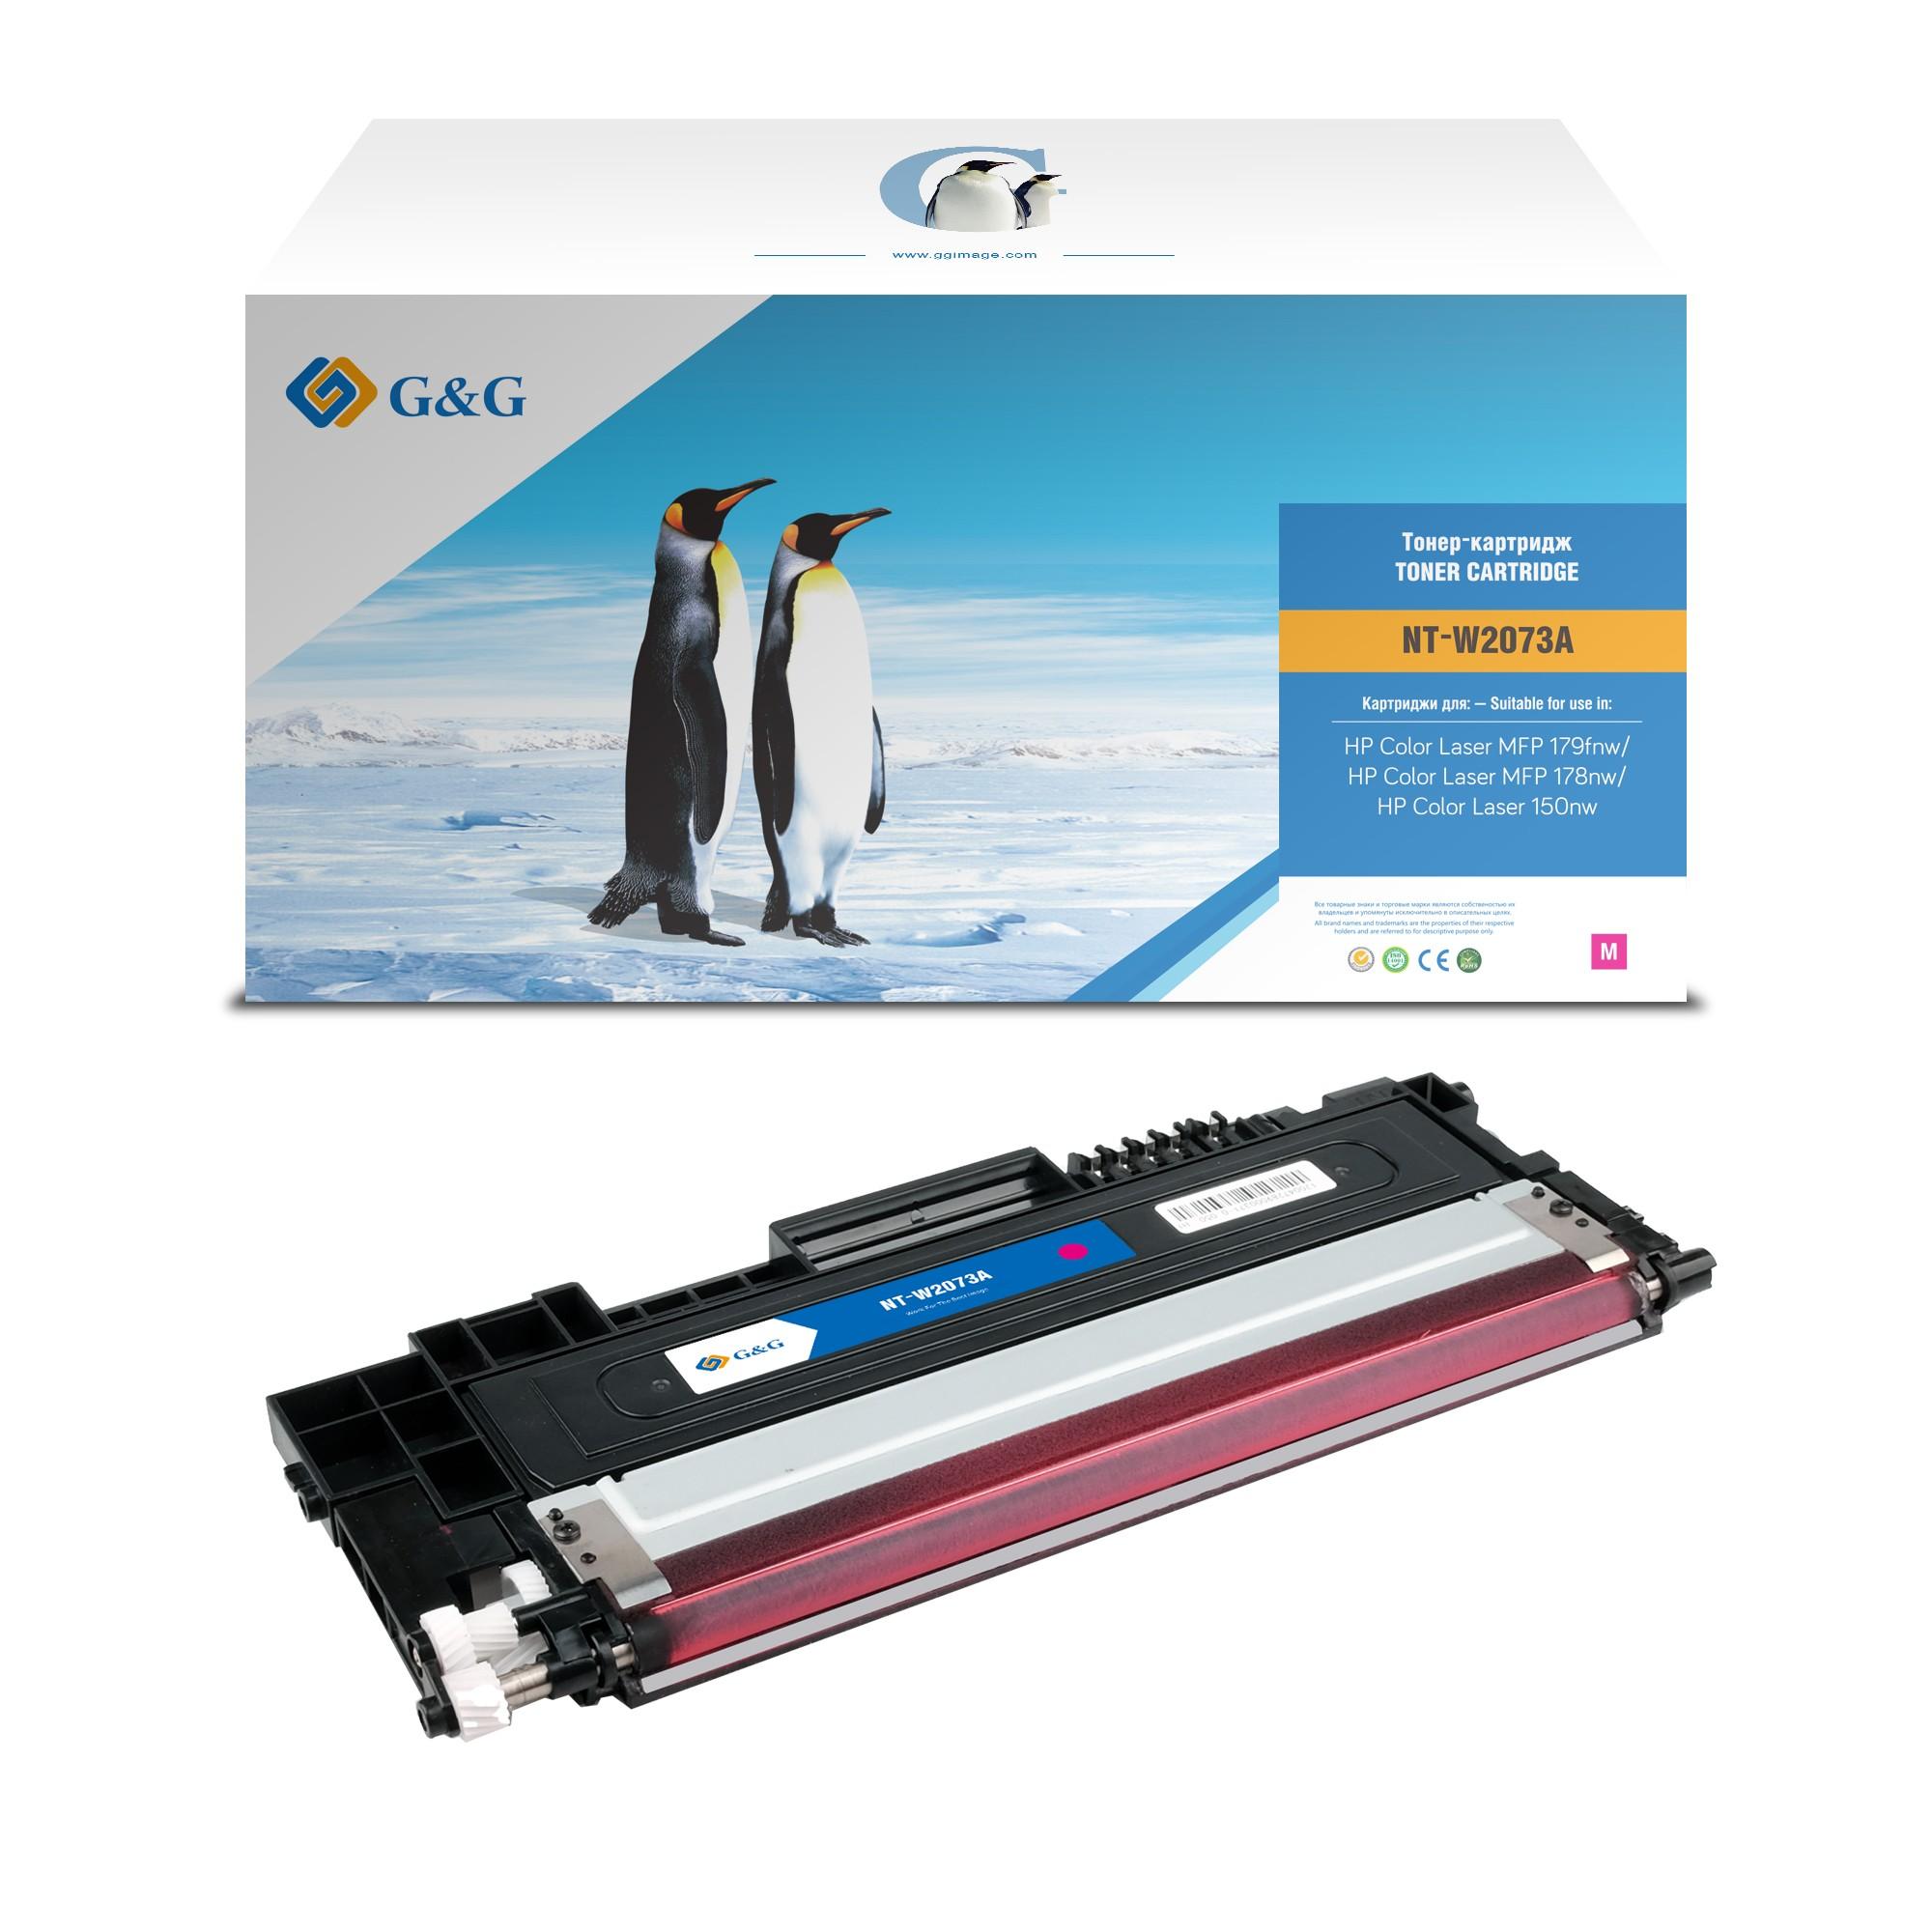 NT-W2073A Тонер-картридж пурпурный для HP Color Laser 179fnw/178nw/150nw  (700 стр)